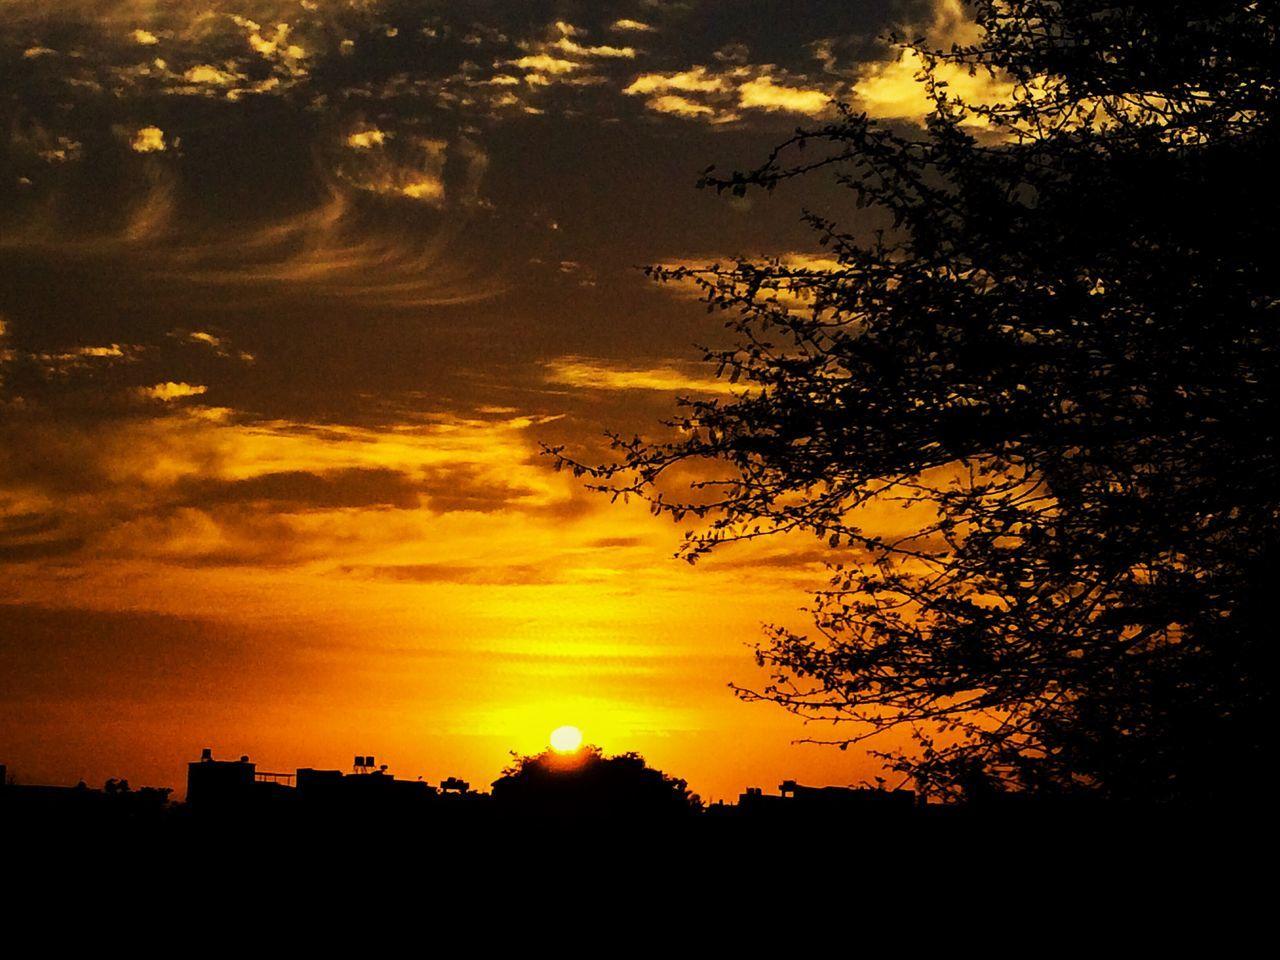 Sunset Sun Beauty In Nature Outdoors First Eyeem Photo Break The Mold The Great Outdoors - 2017 EyeEm Awards